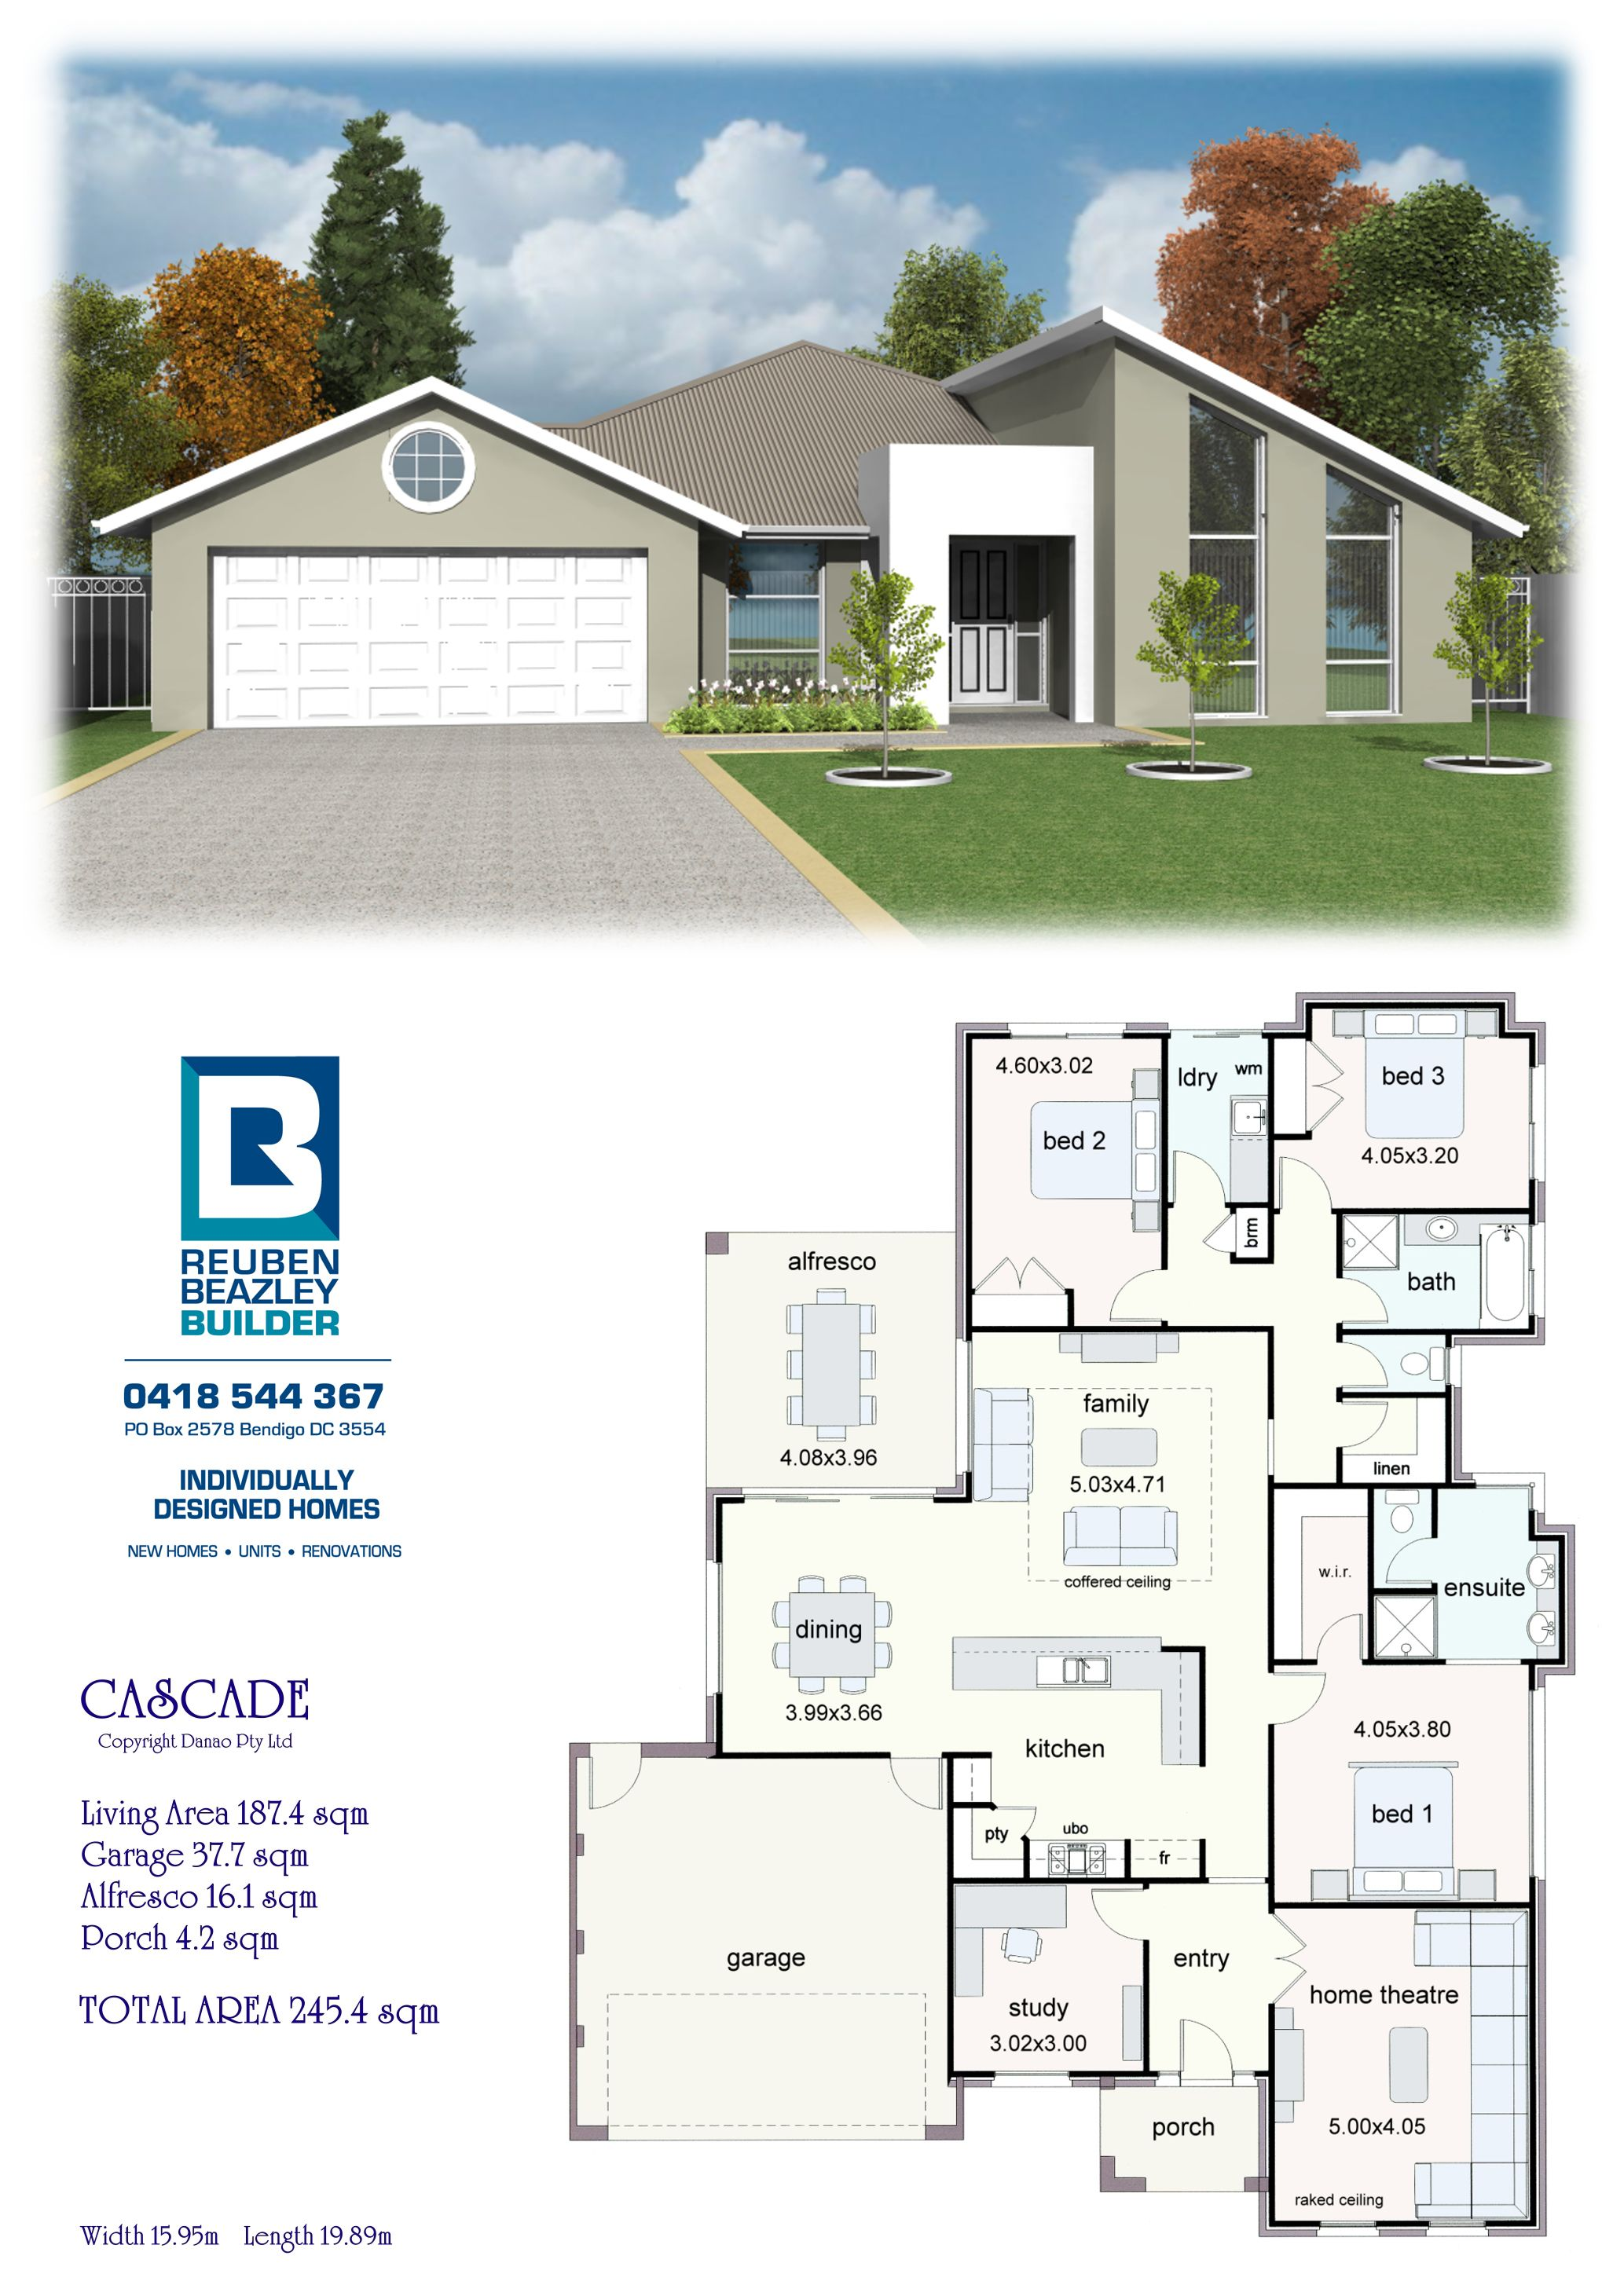 The Cascade Dream House Plans House Blueprints Design Your Dream House